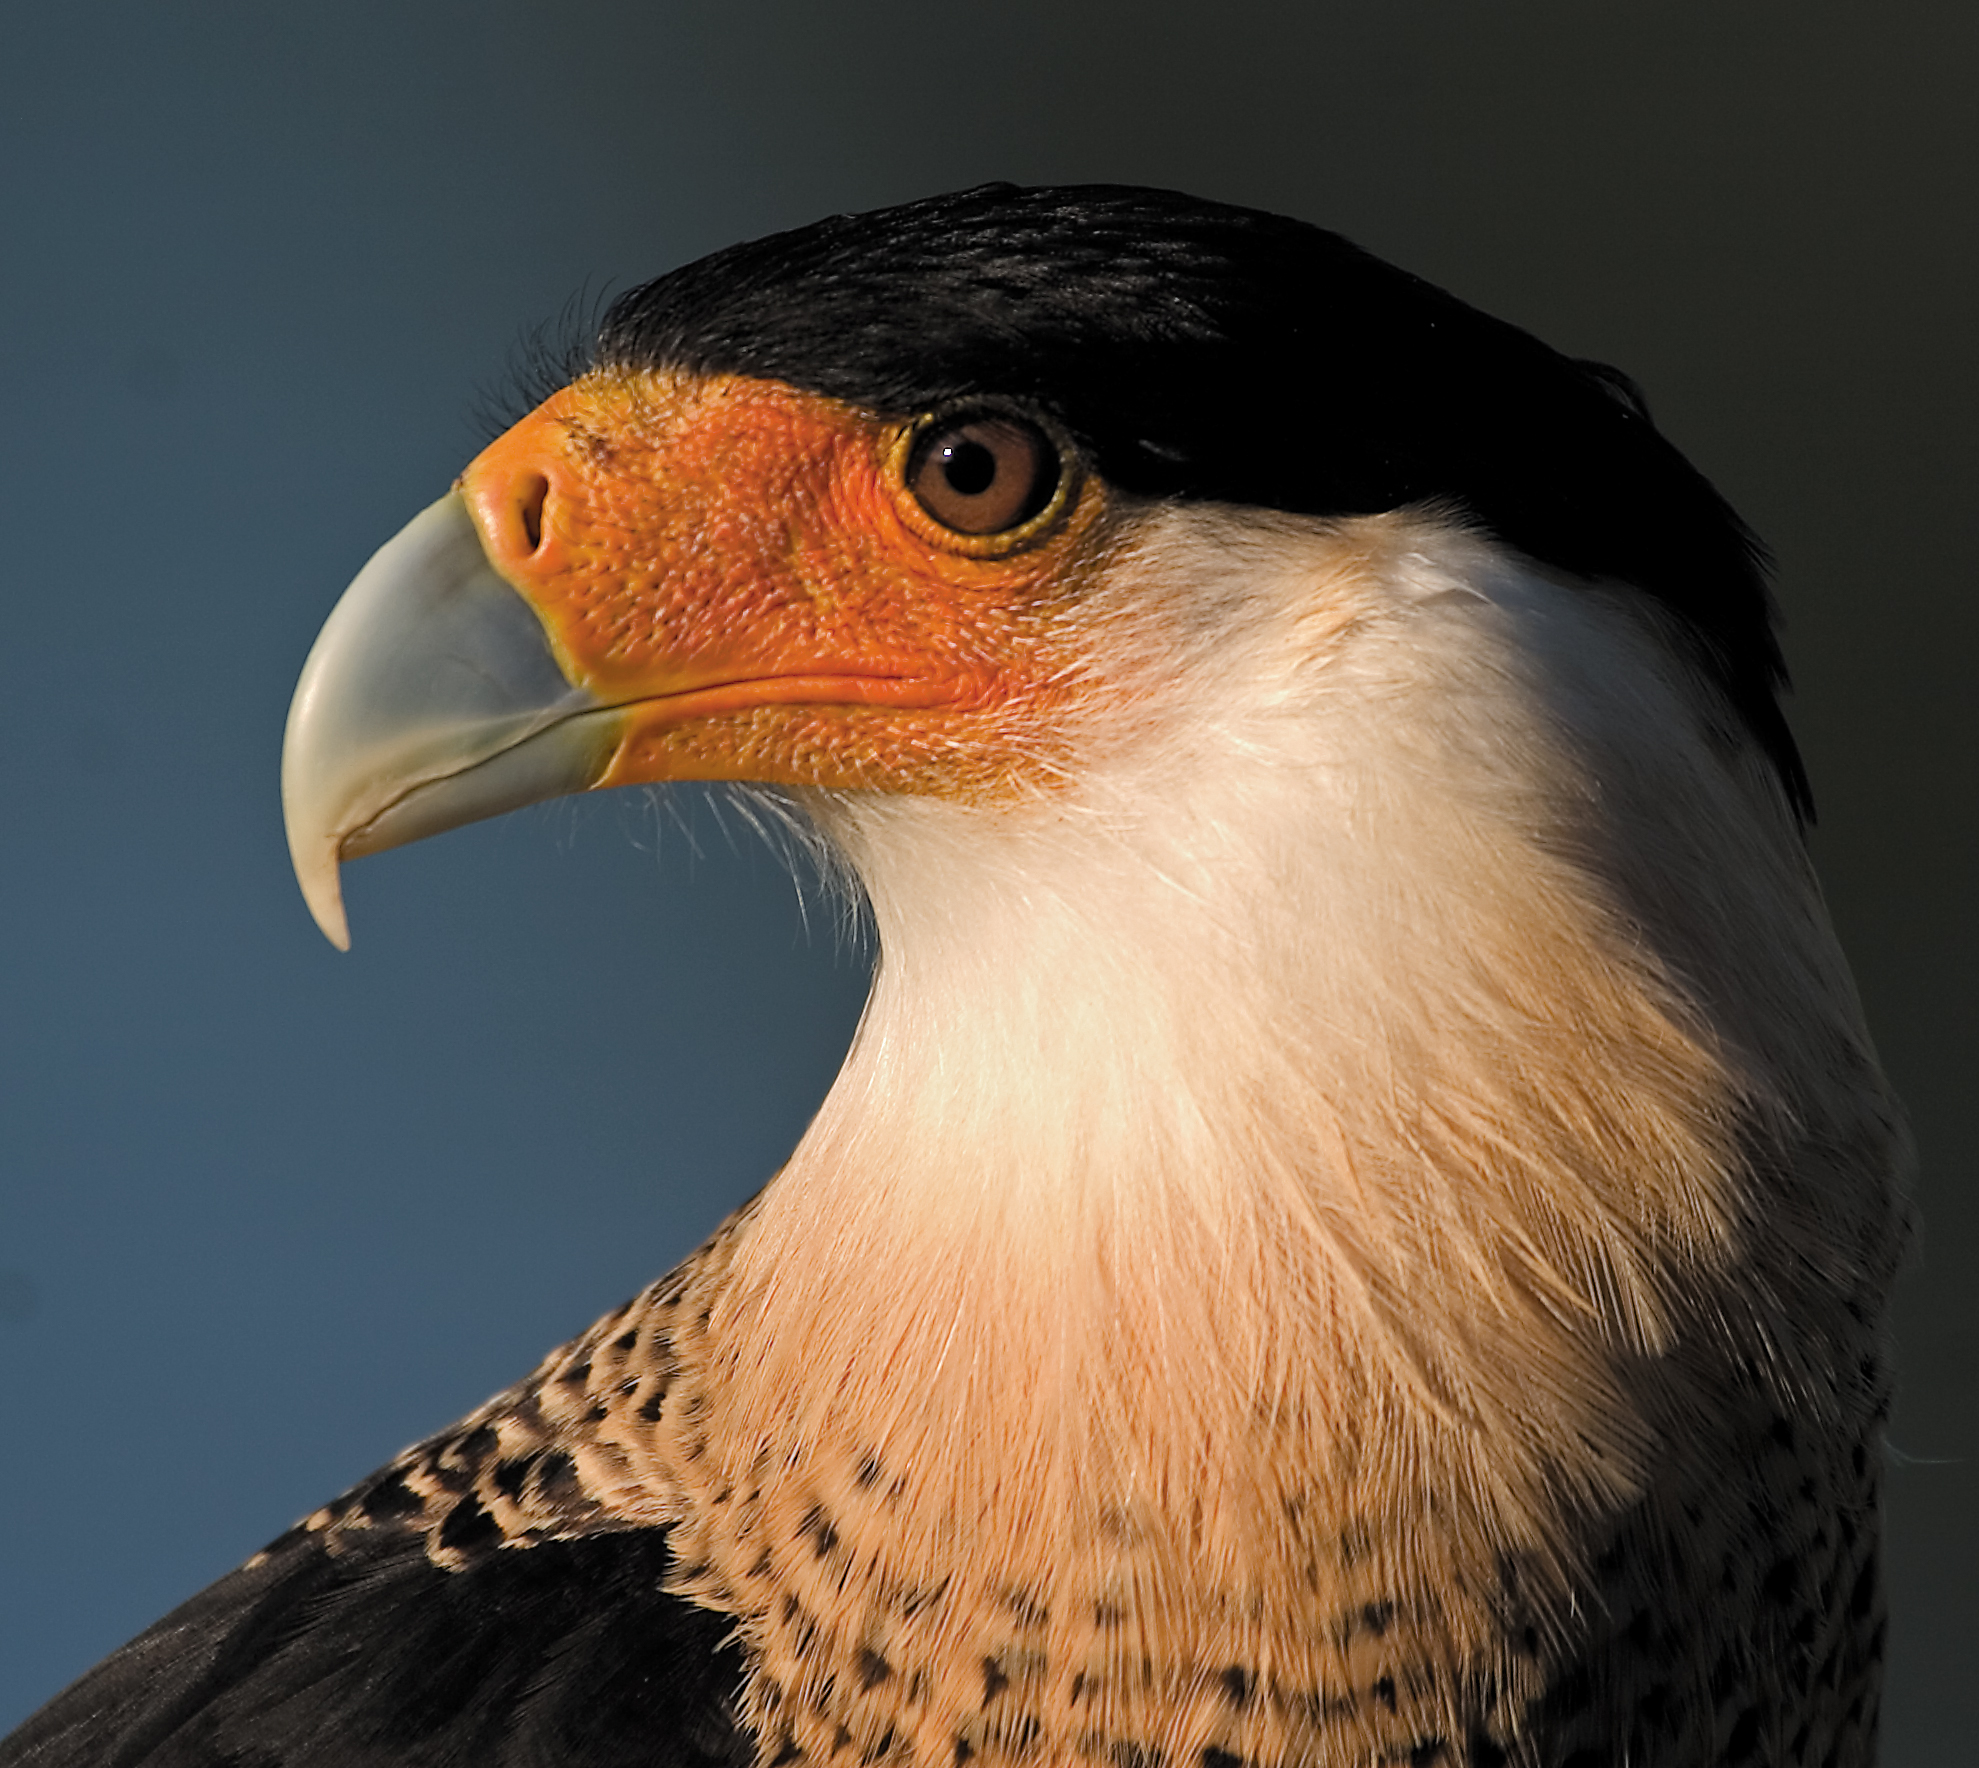 Rick Sammon's Birds010.jpg